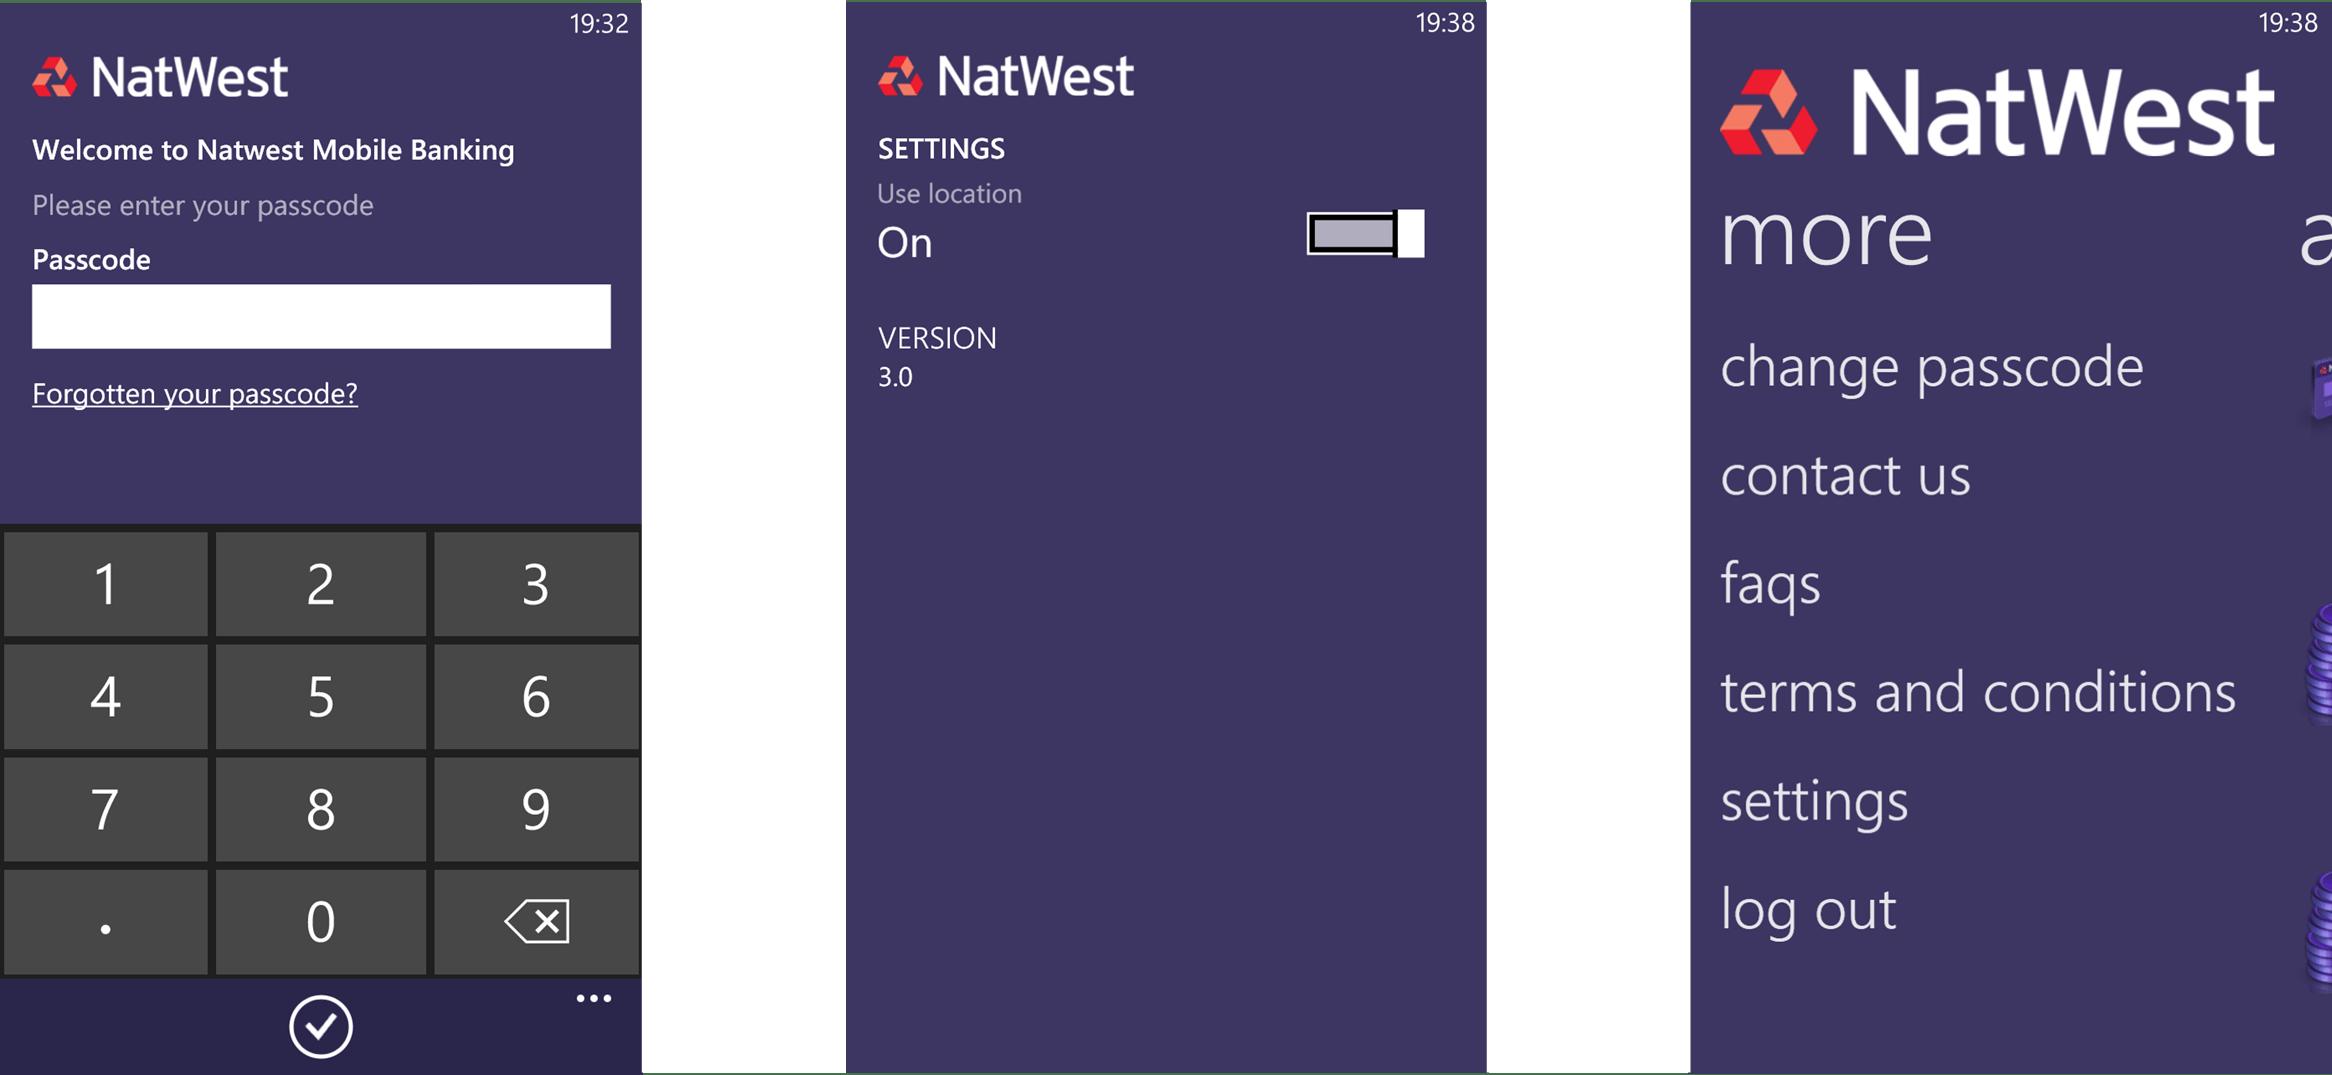 NatWest App (3) Login